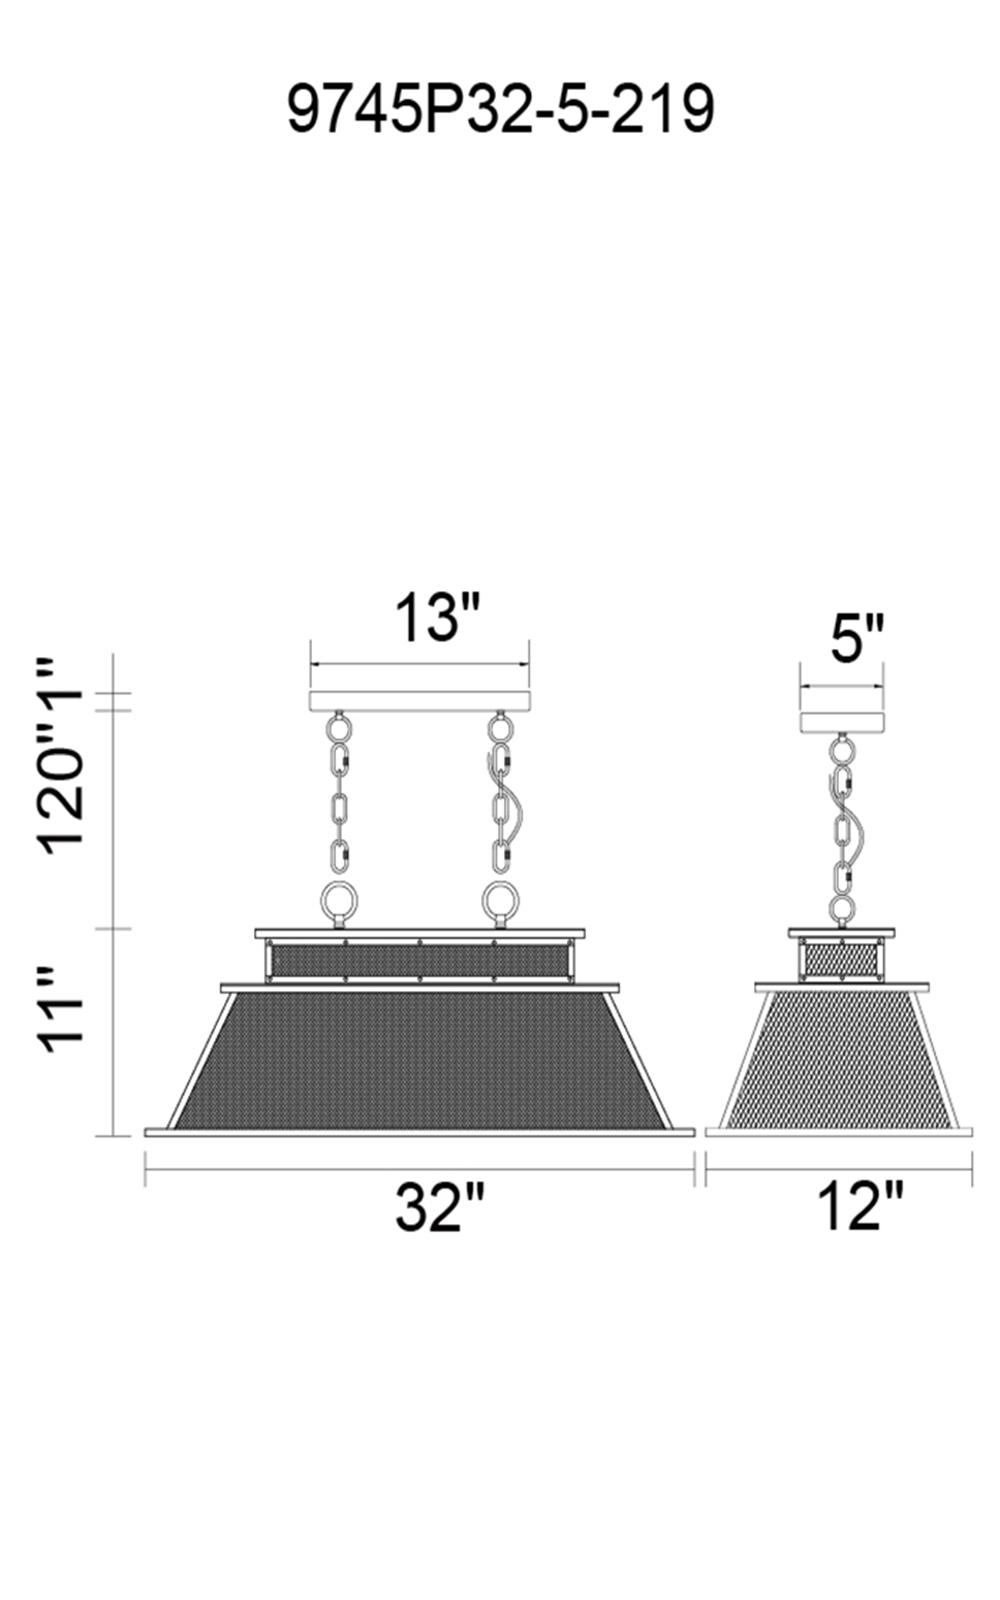 CWI Lighting Savill 5 Light Island Chandelier With Reddish Black Model: 9745P32-5-219 Line Drawing